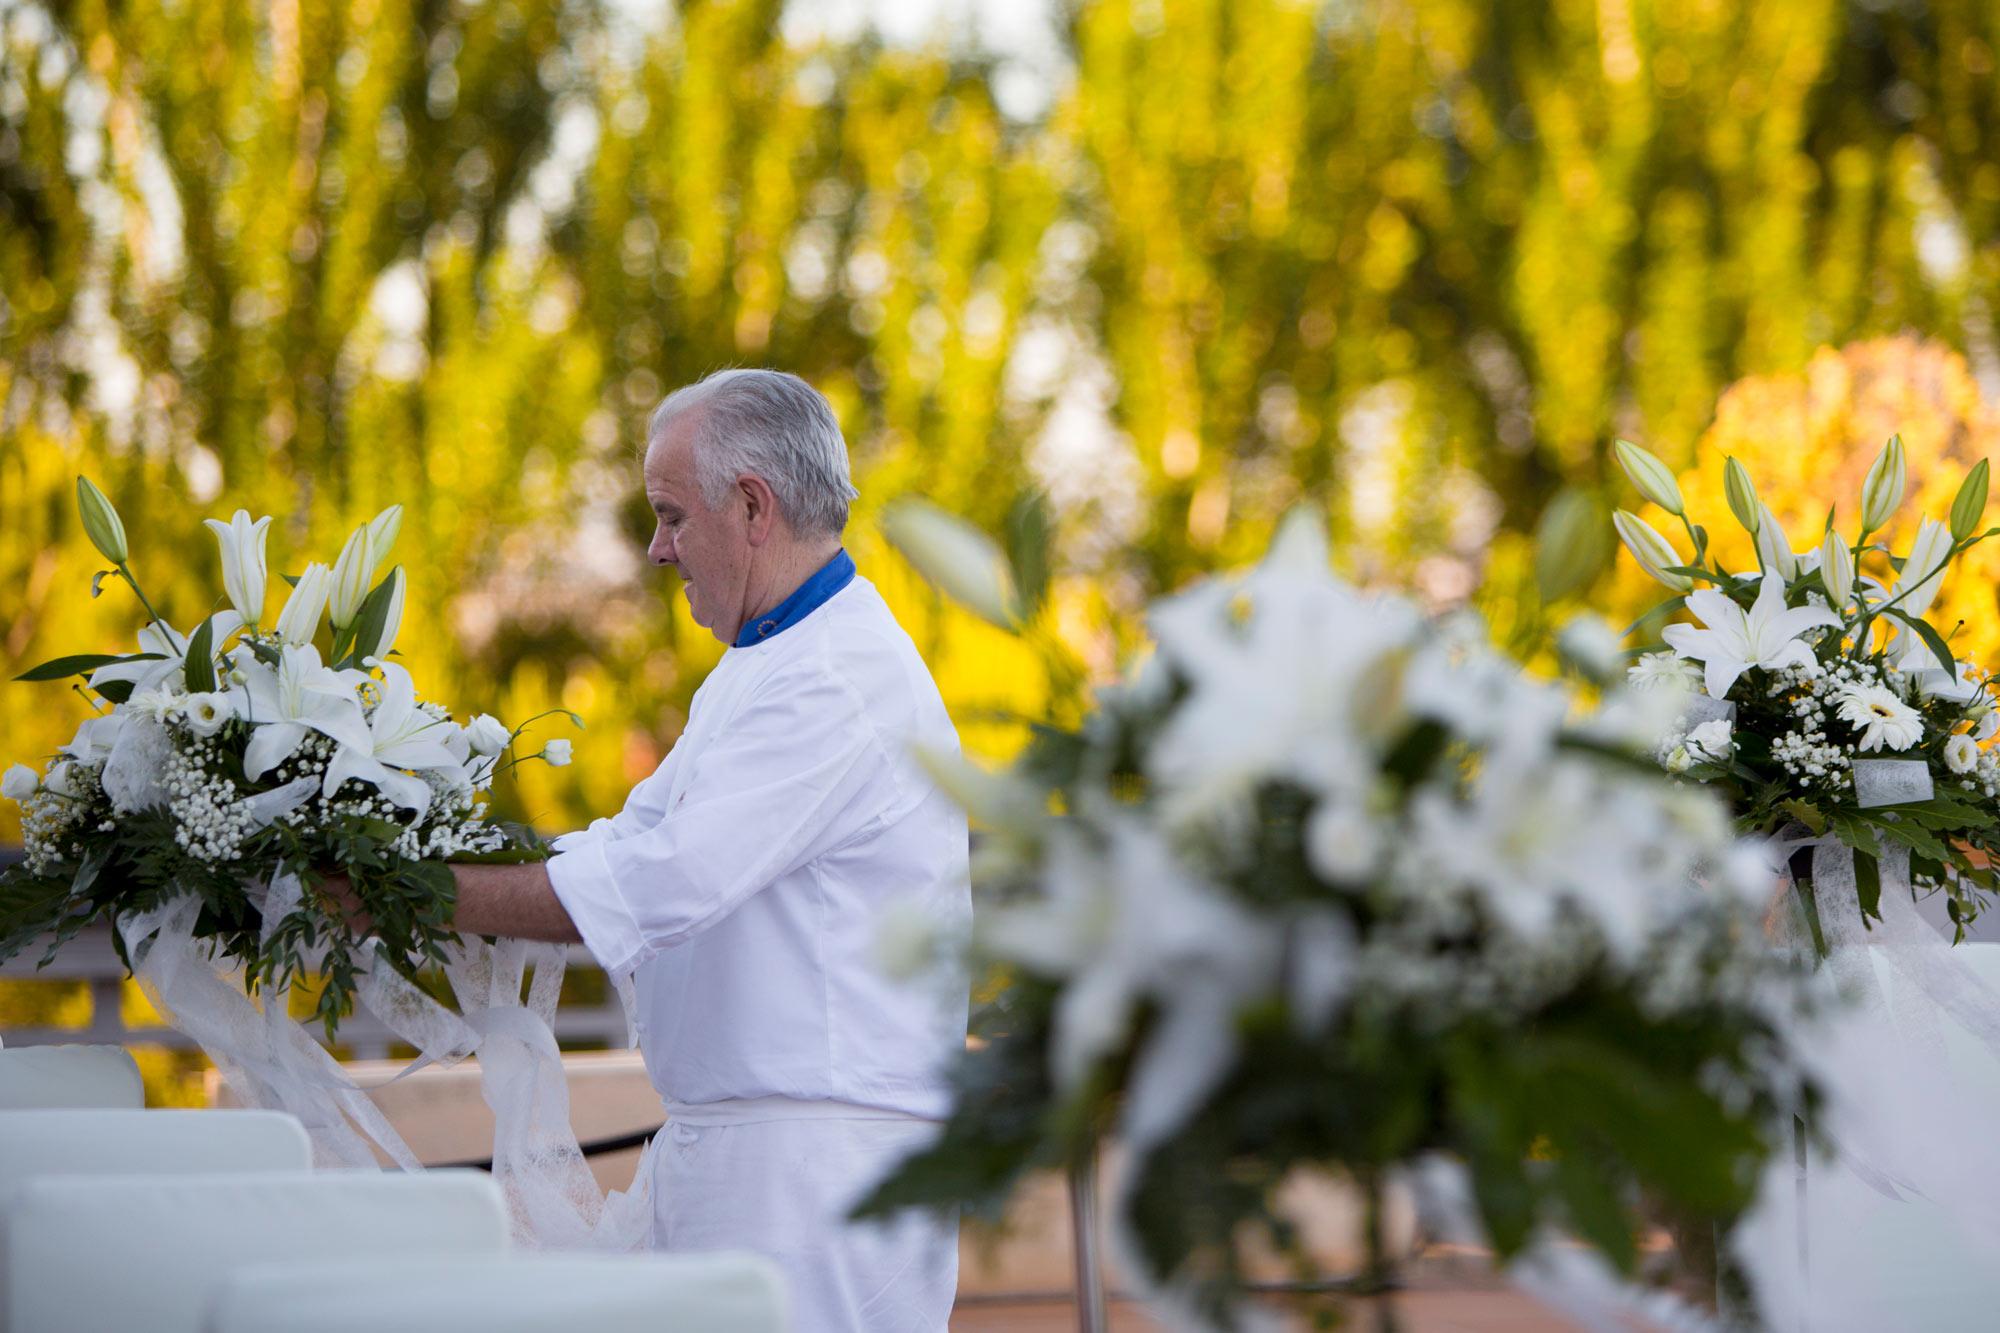 Boda 4 - lorenzo poniendo flores